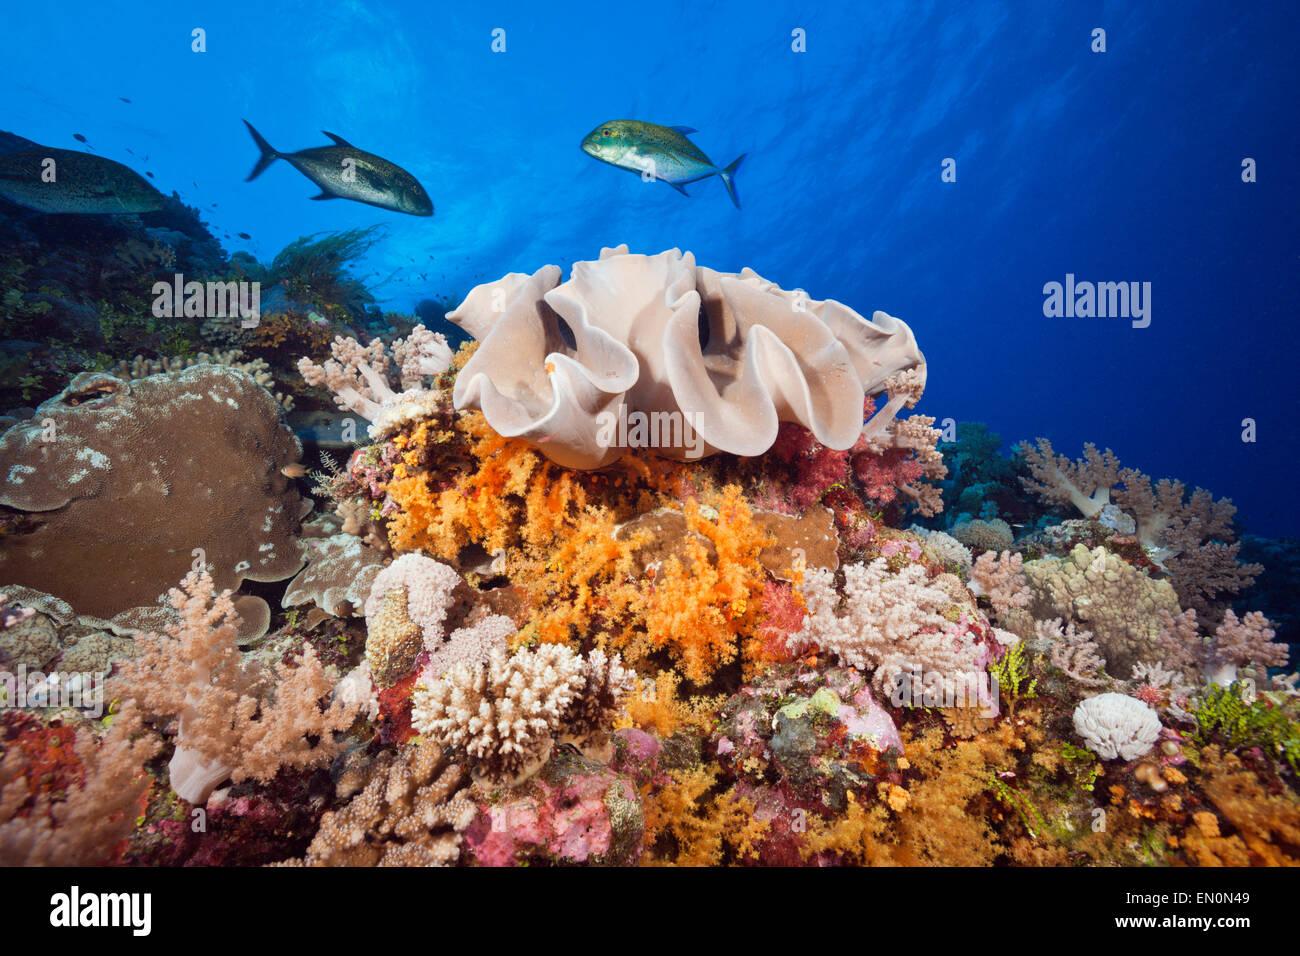 Species-rich Coral Reef, Osprey Reef, Coral Sea, Australia - Stock Image